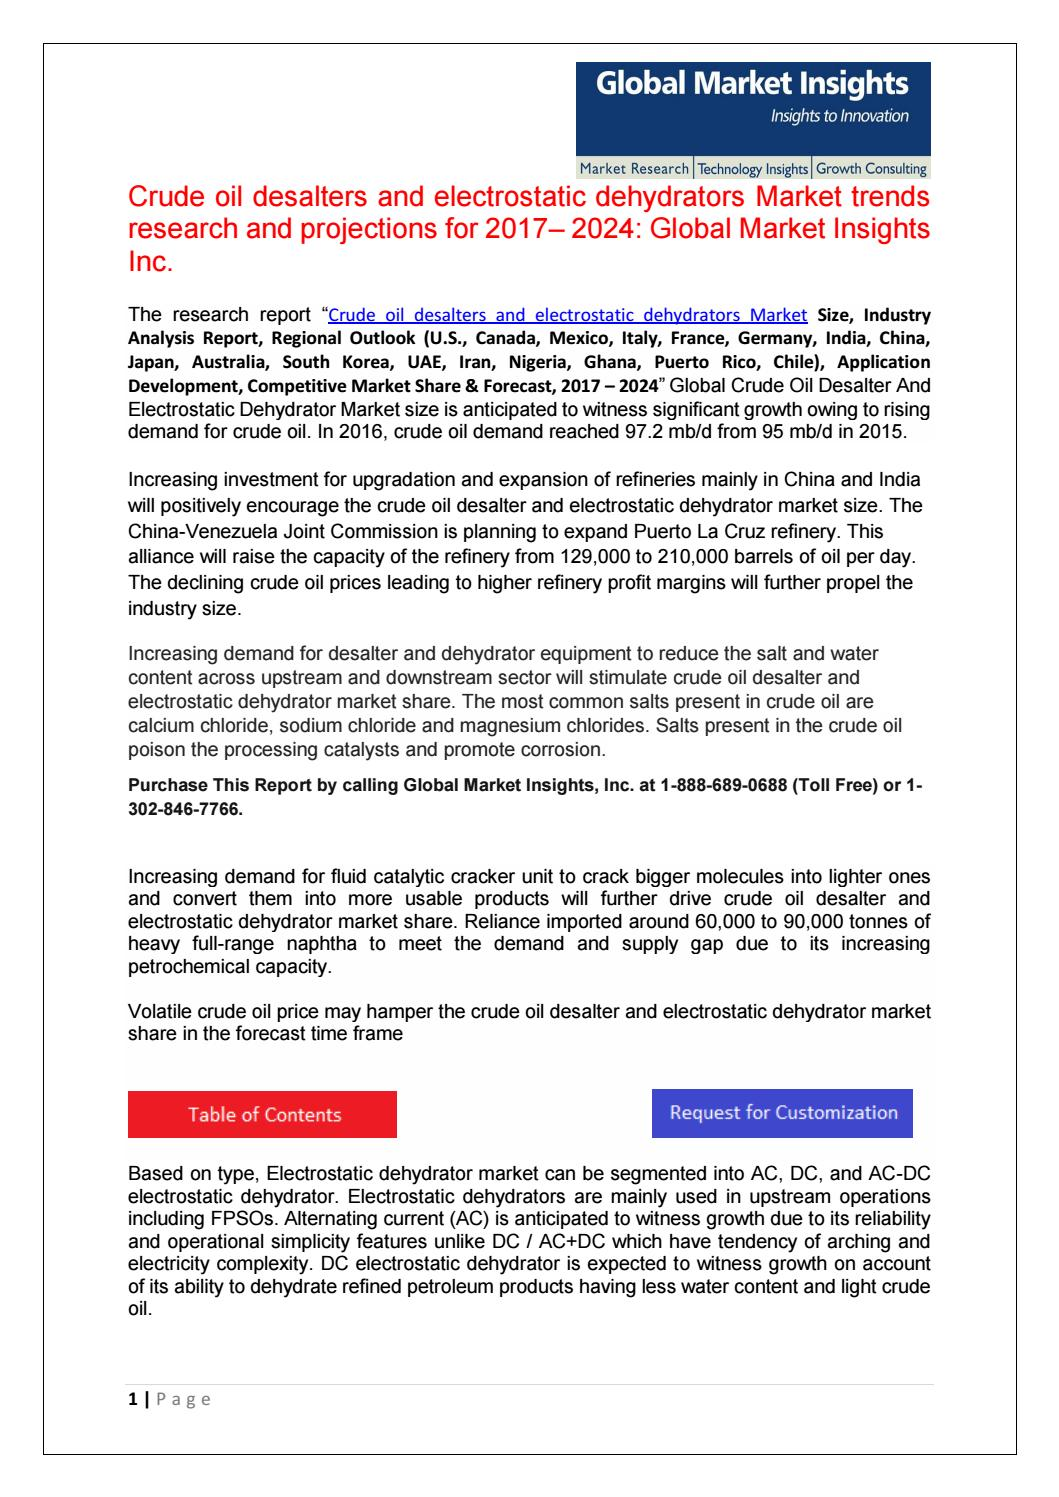 Crude oil desalter & electrostatic dehydrator market by